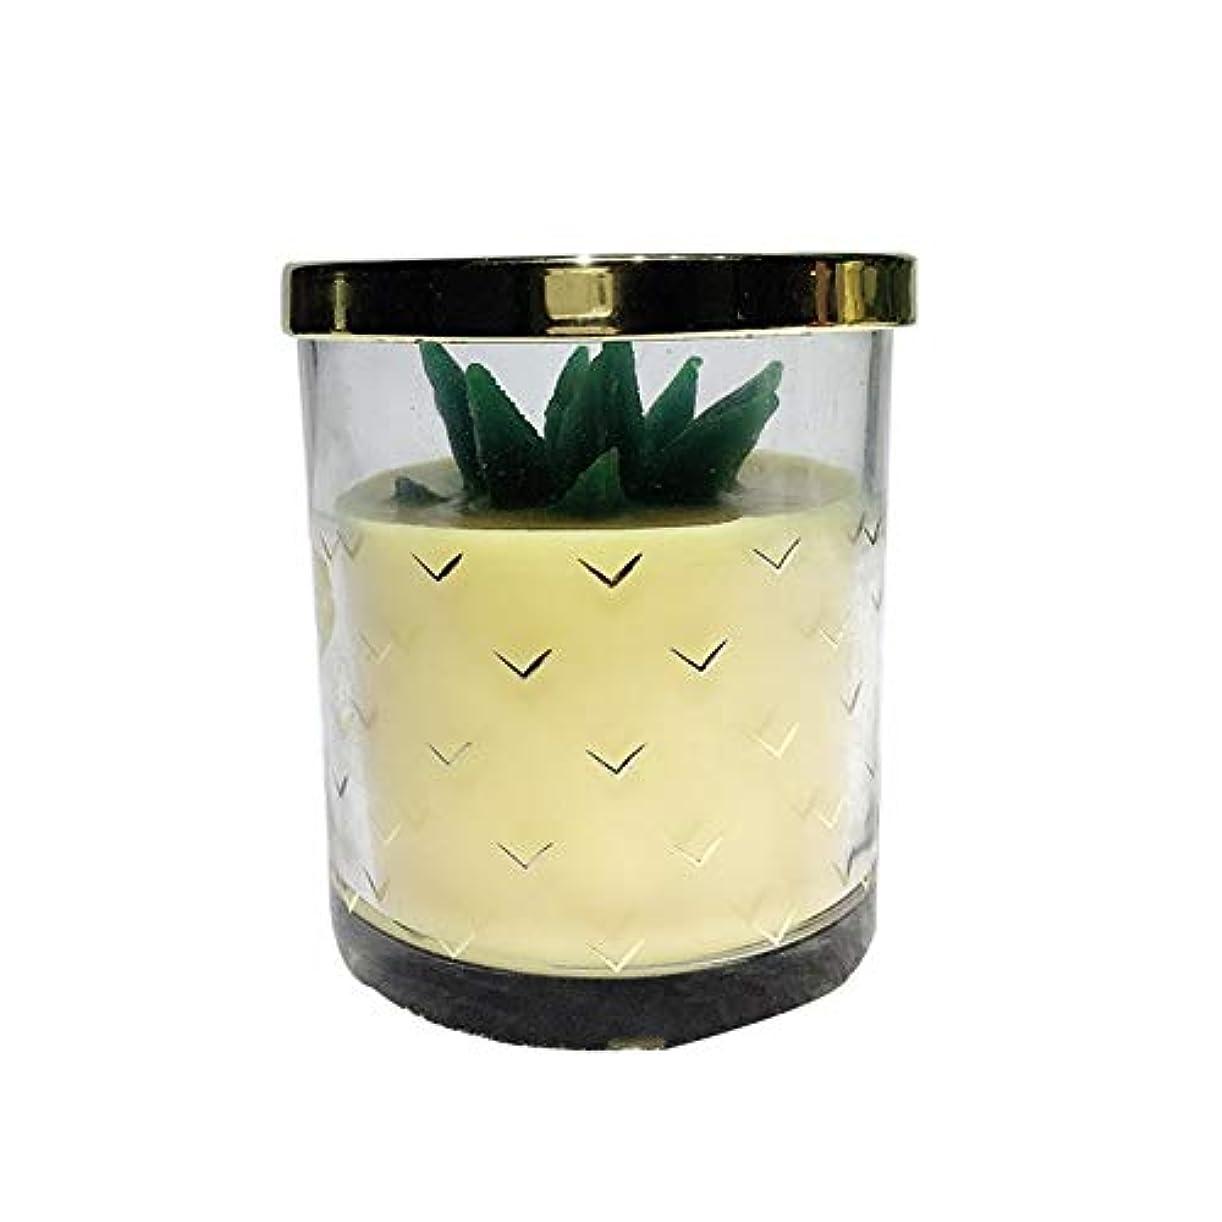 Guomao 大豆ワックスフルーツキャンドルバレンタインデークリエイティブギフト (色 : Pineapple)